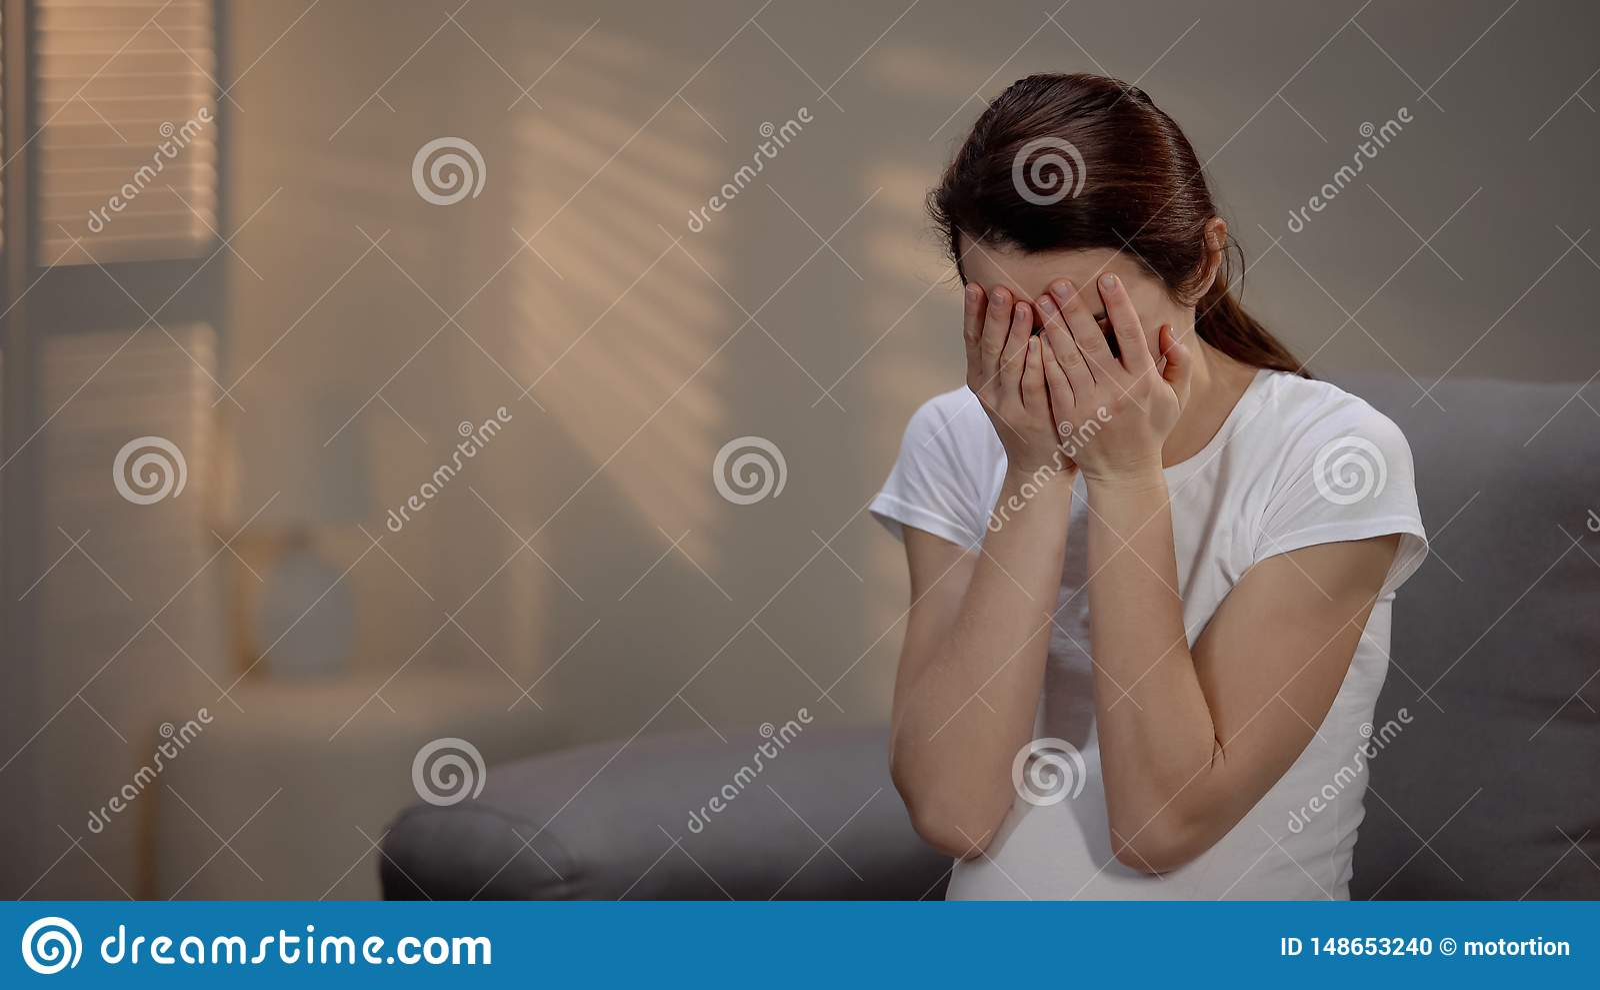 Sad pregnant woman crying, suffering prenatal depression, single motherhood